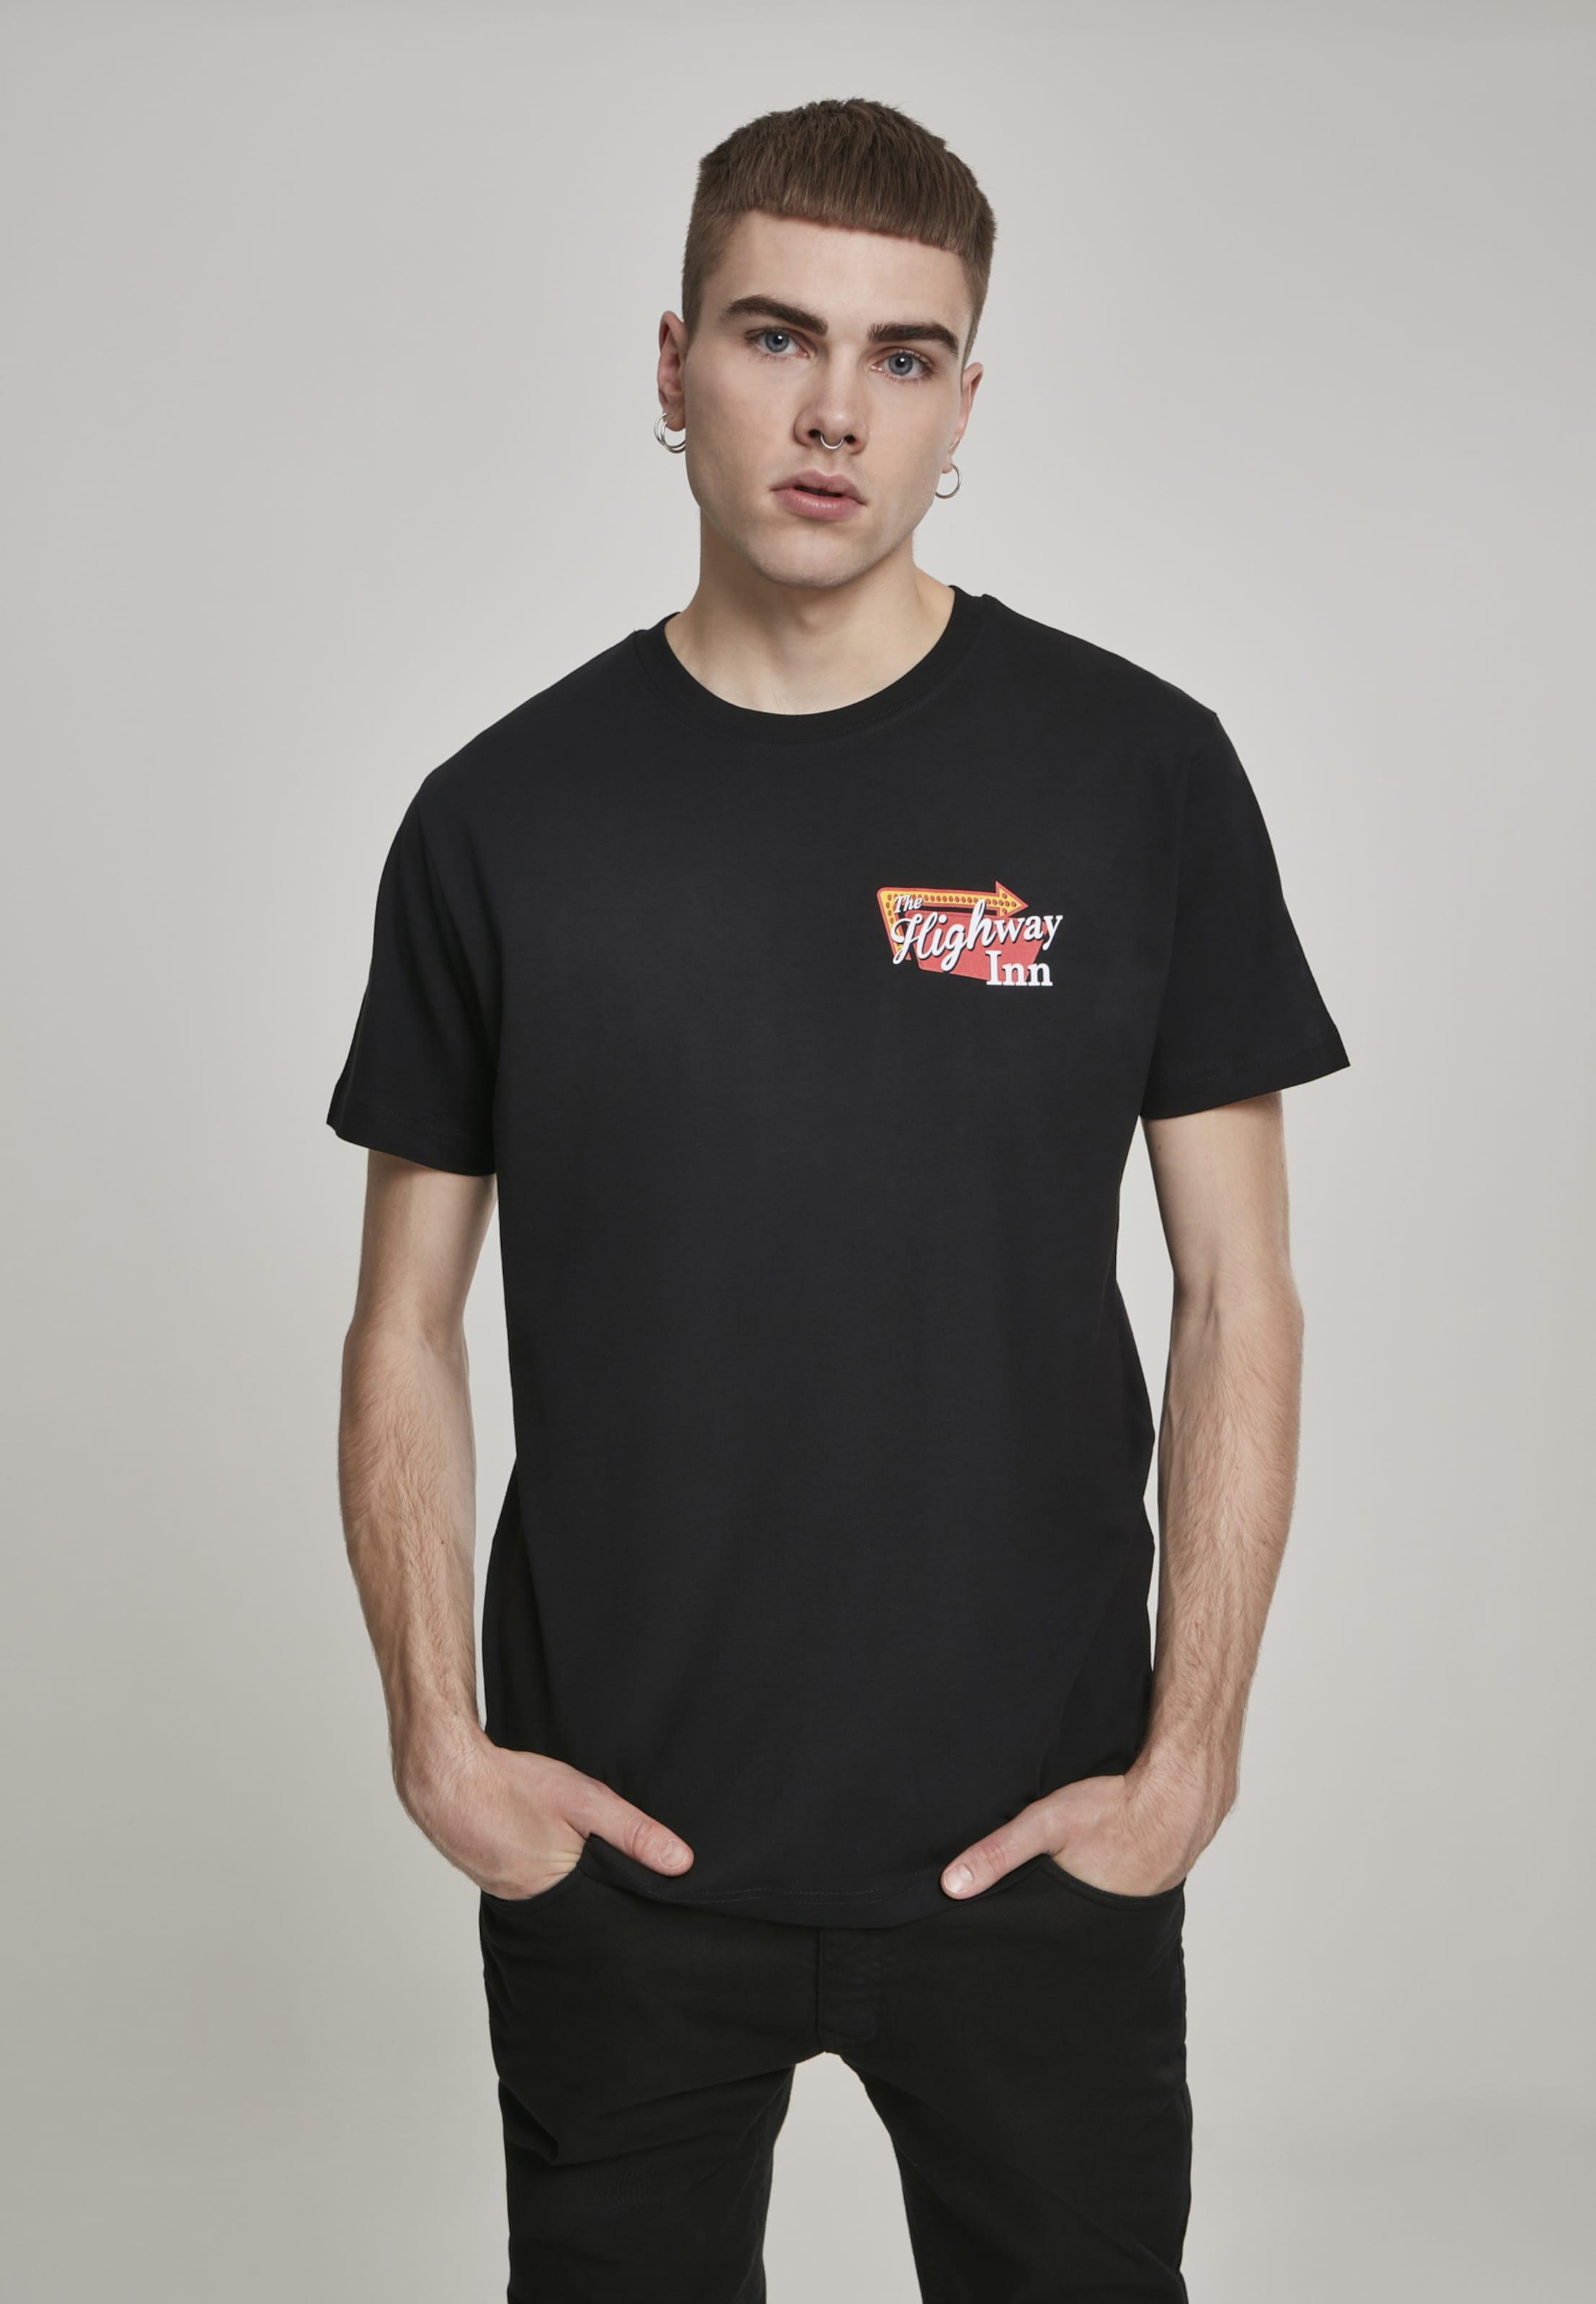 Mister Tee T-Shirt 'Highway Inn' in rot / schwarz / weiß Jersey MT784-00007-0042